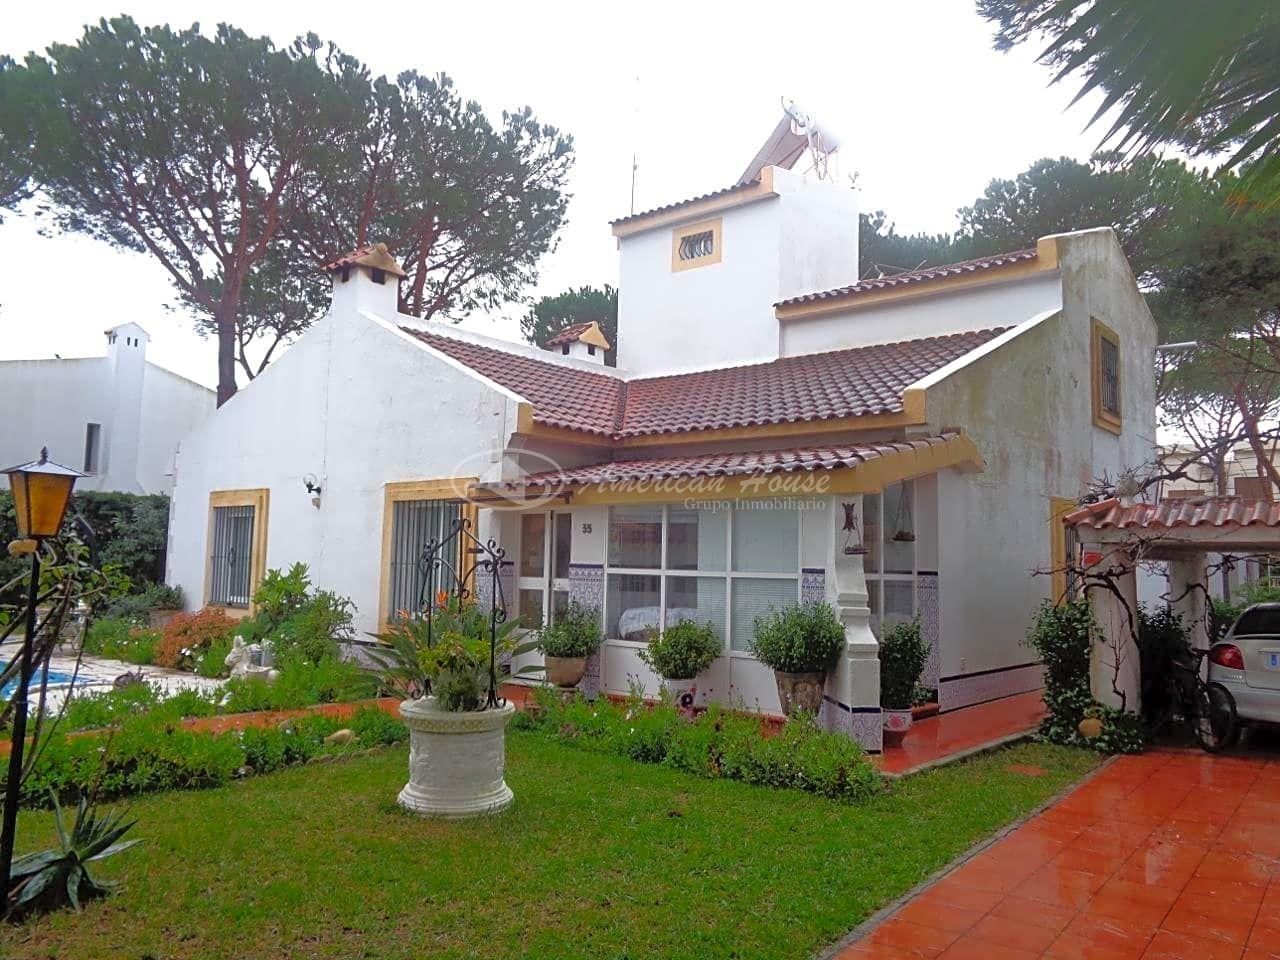 Alquiler de Chalet Vacacional en Roche para Agosto, Conil de la Fra., Cádiz